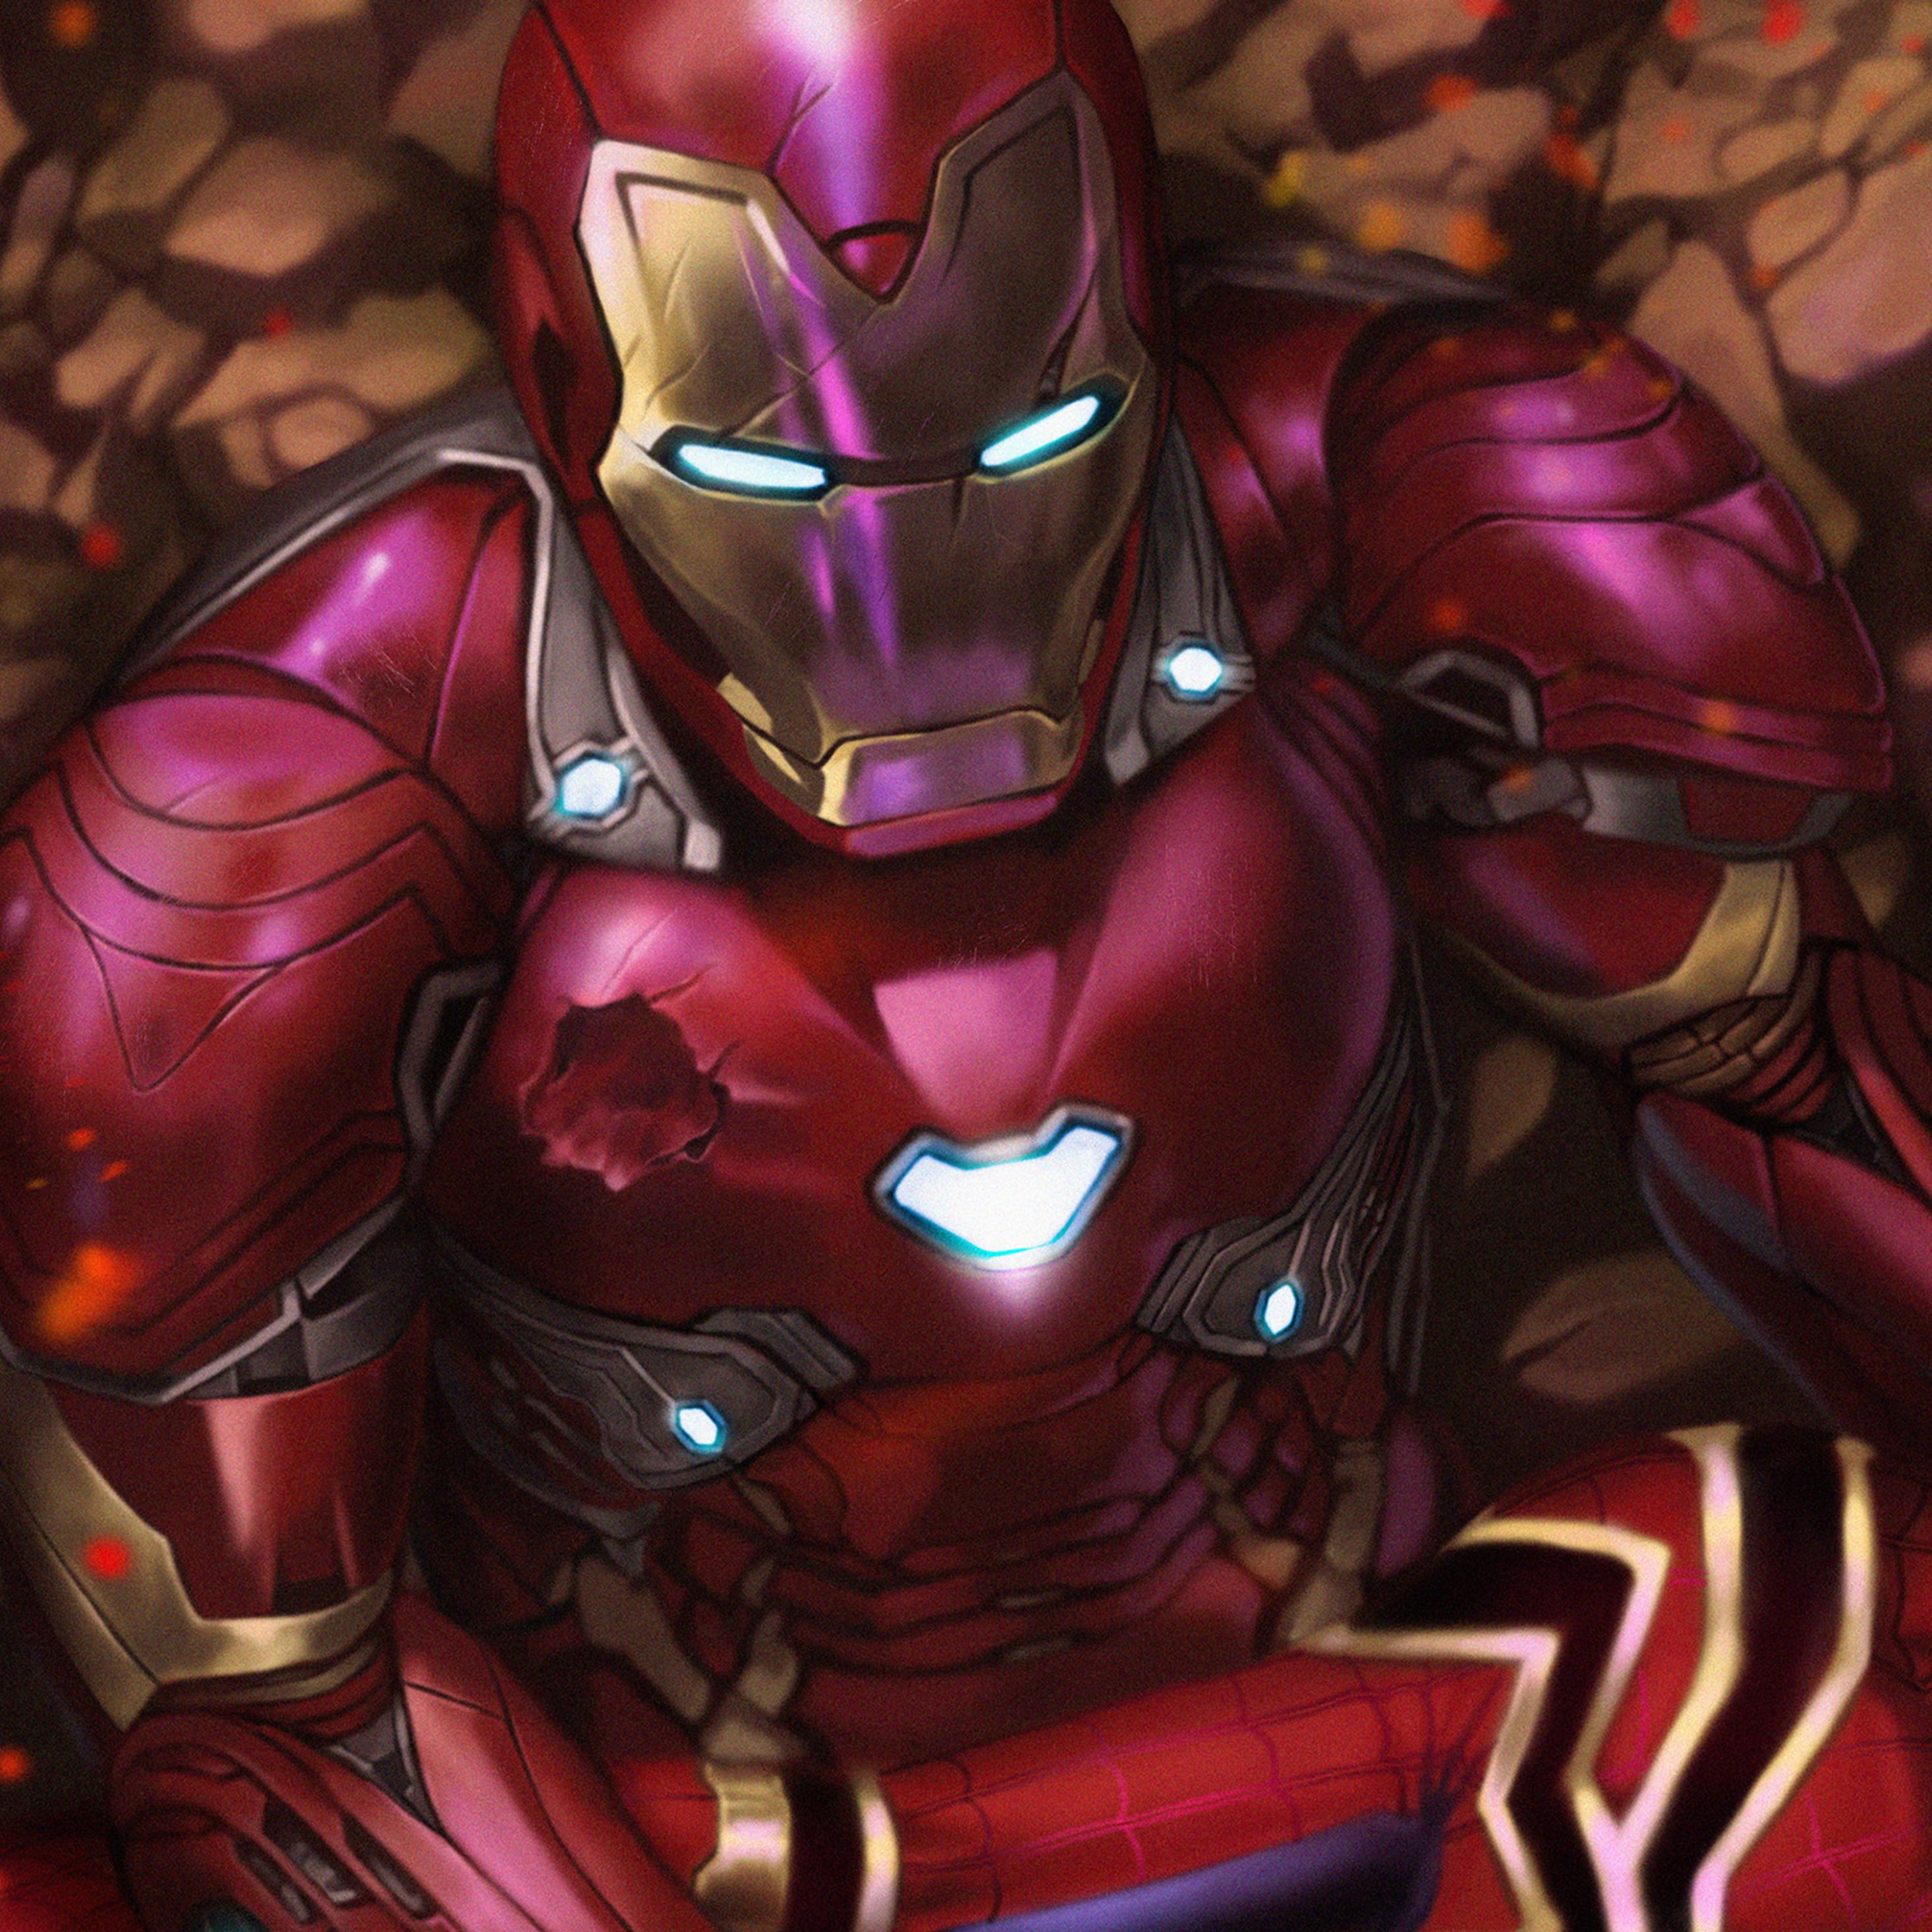 spiderman-died-in-iron-man-arms-artwork-ws.jpg